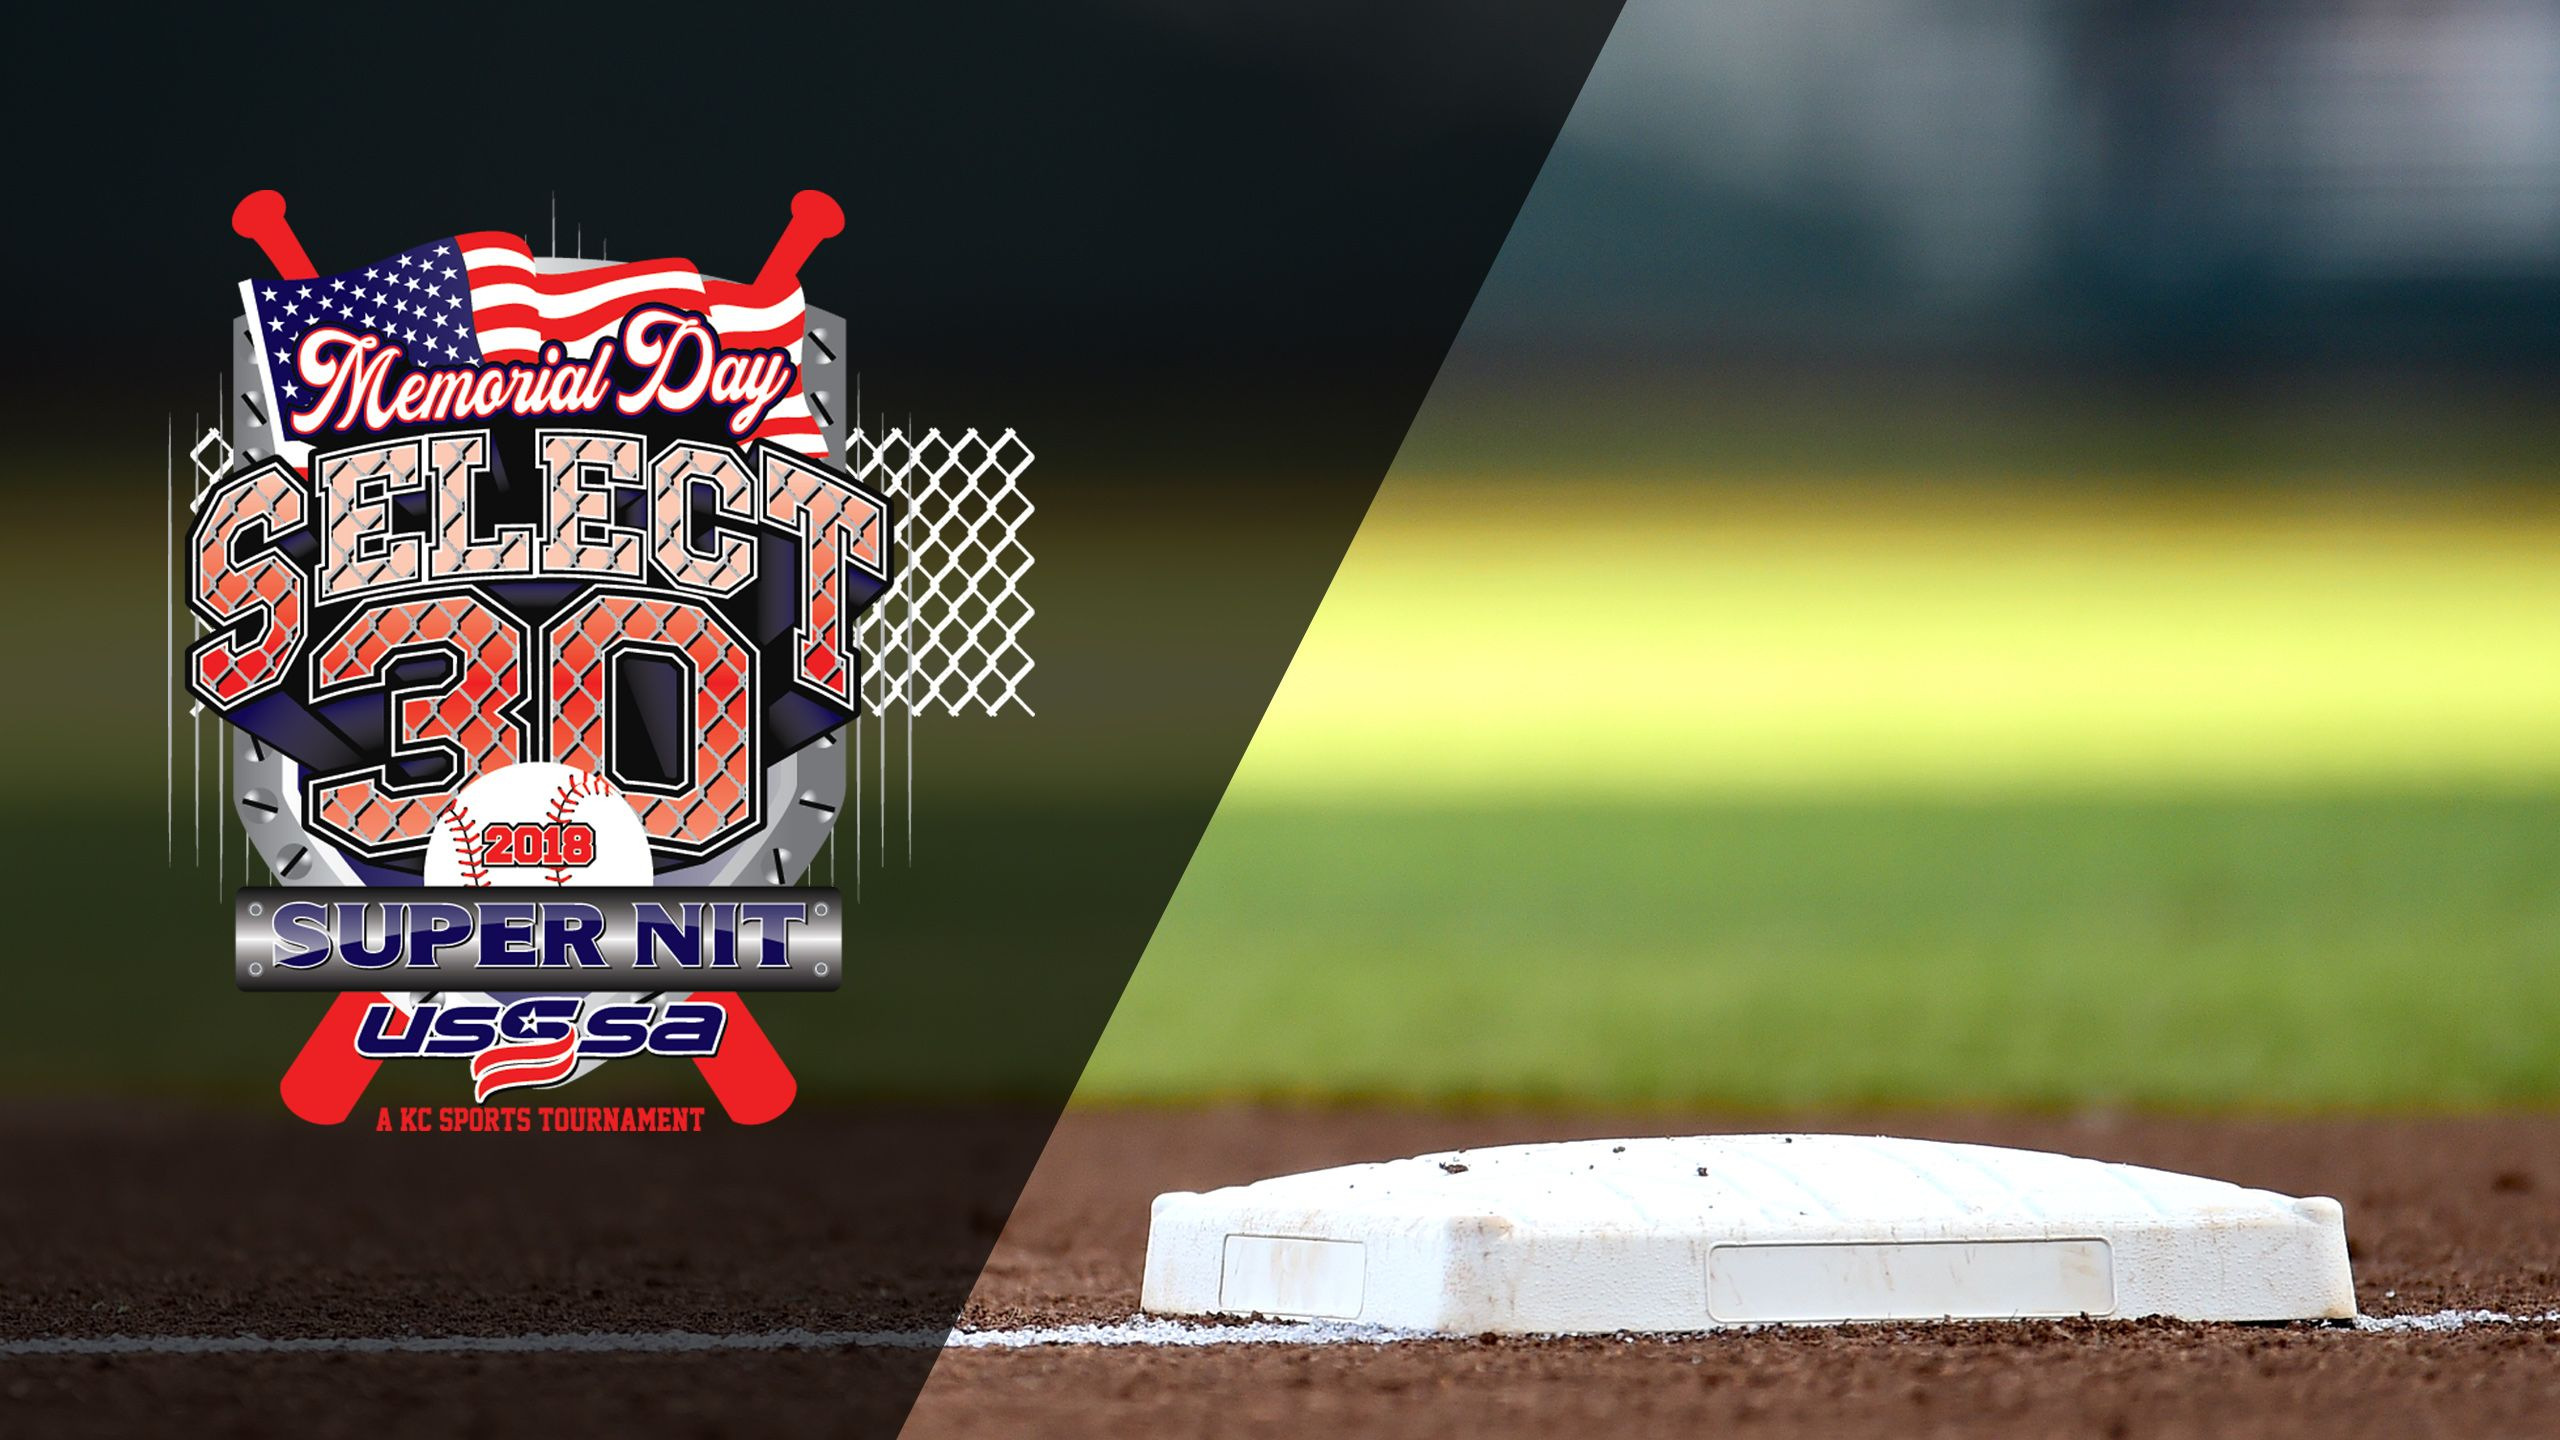 USSSA Memorial Day Fastpitch Softball (Playoffs)